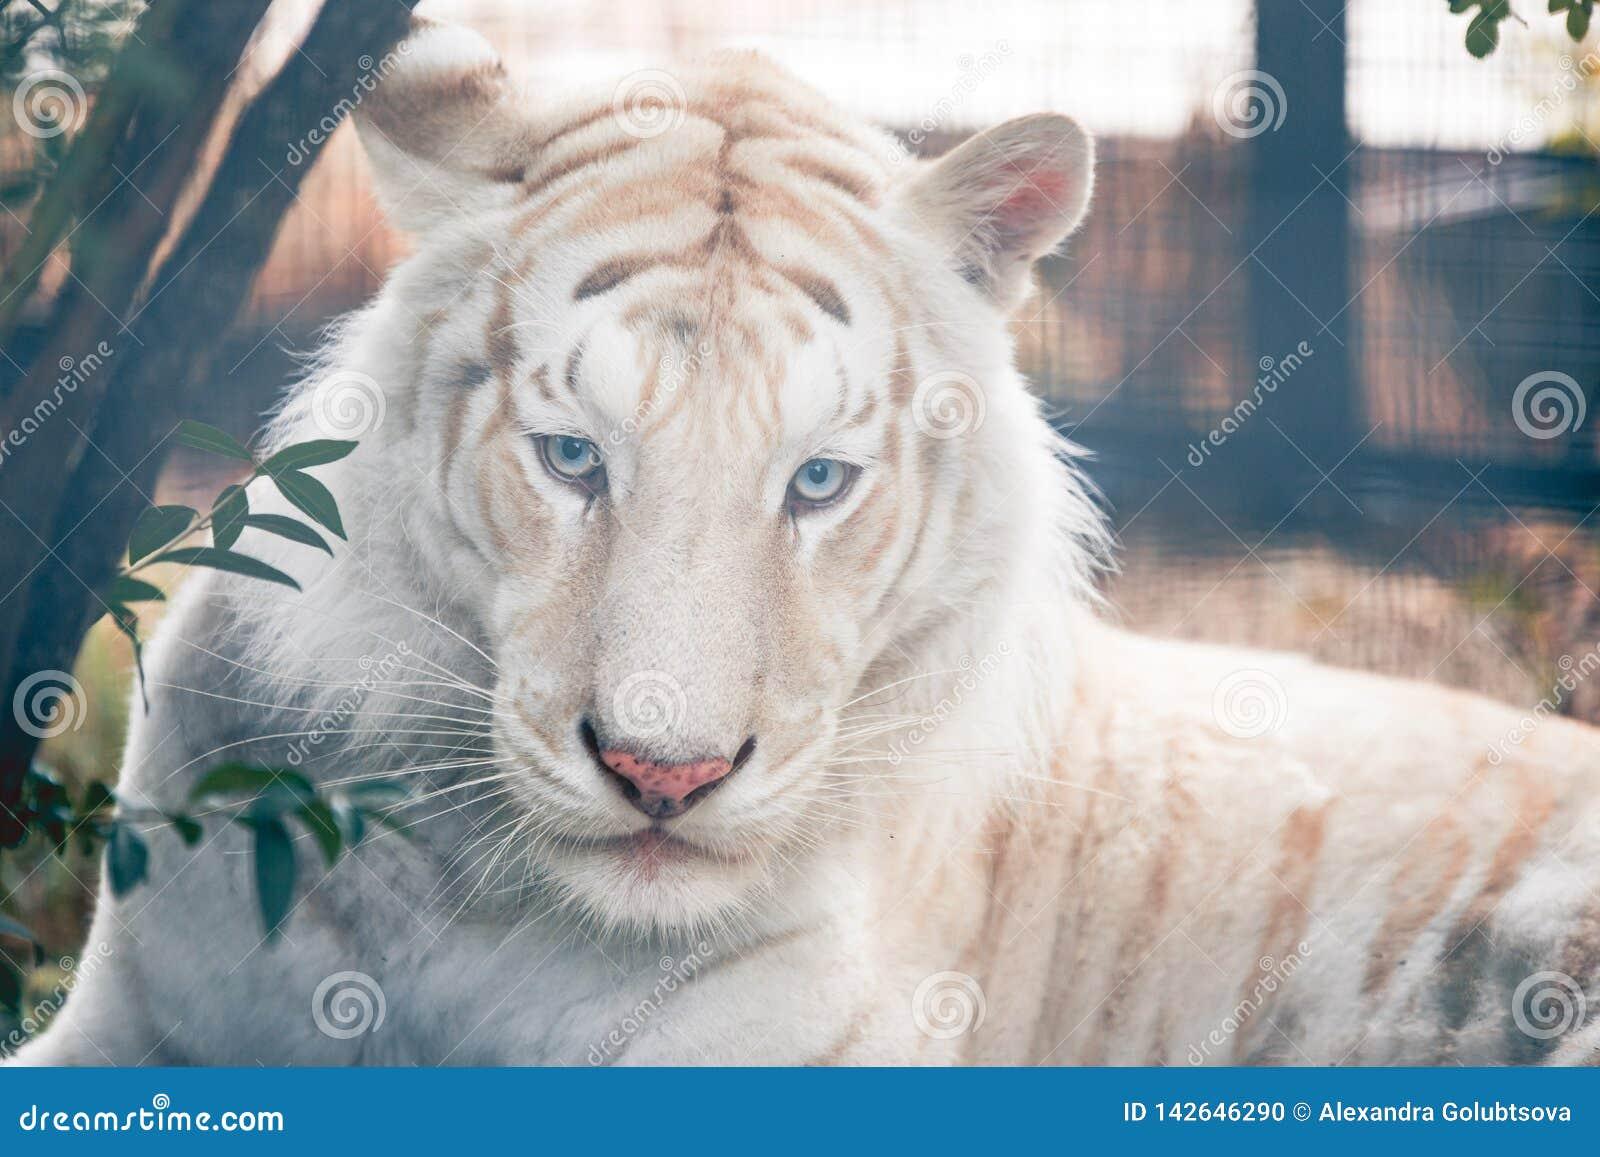 White tiger portrait.